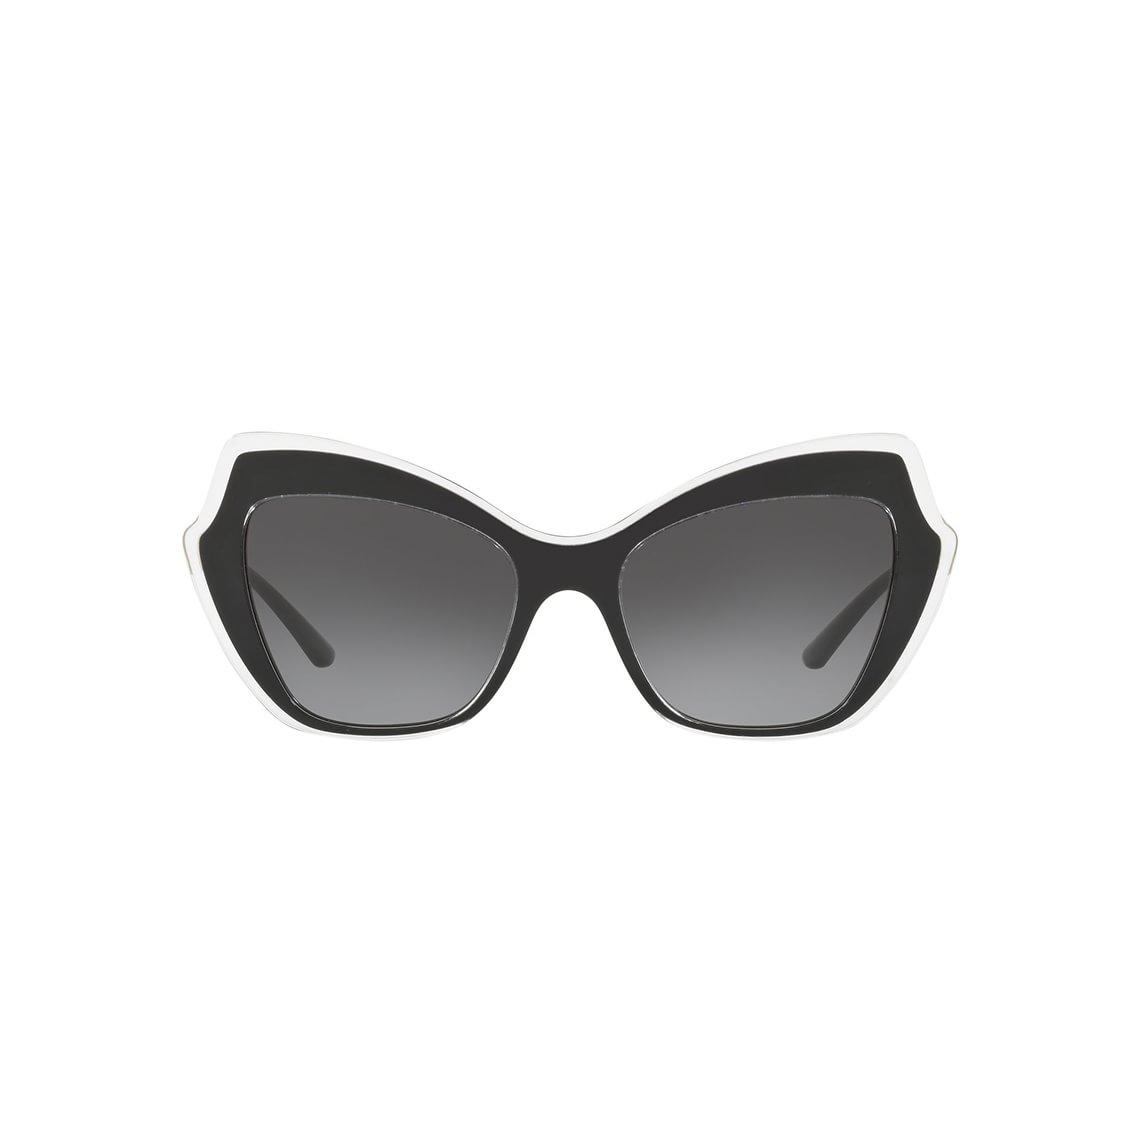 Dolce & Gabbana 0DG4361 52 53838G